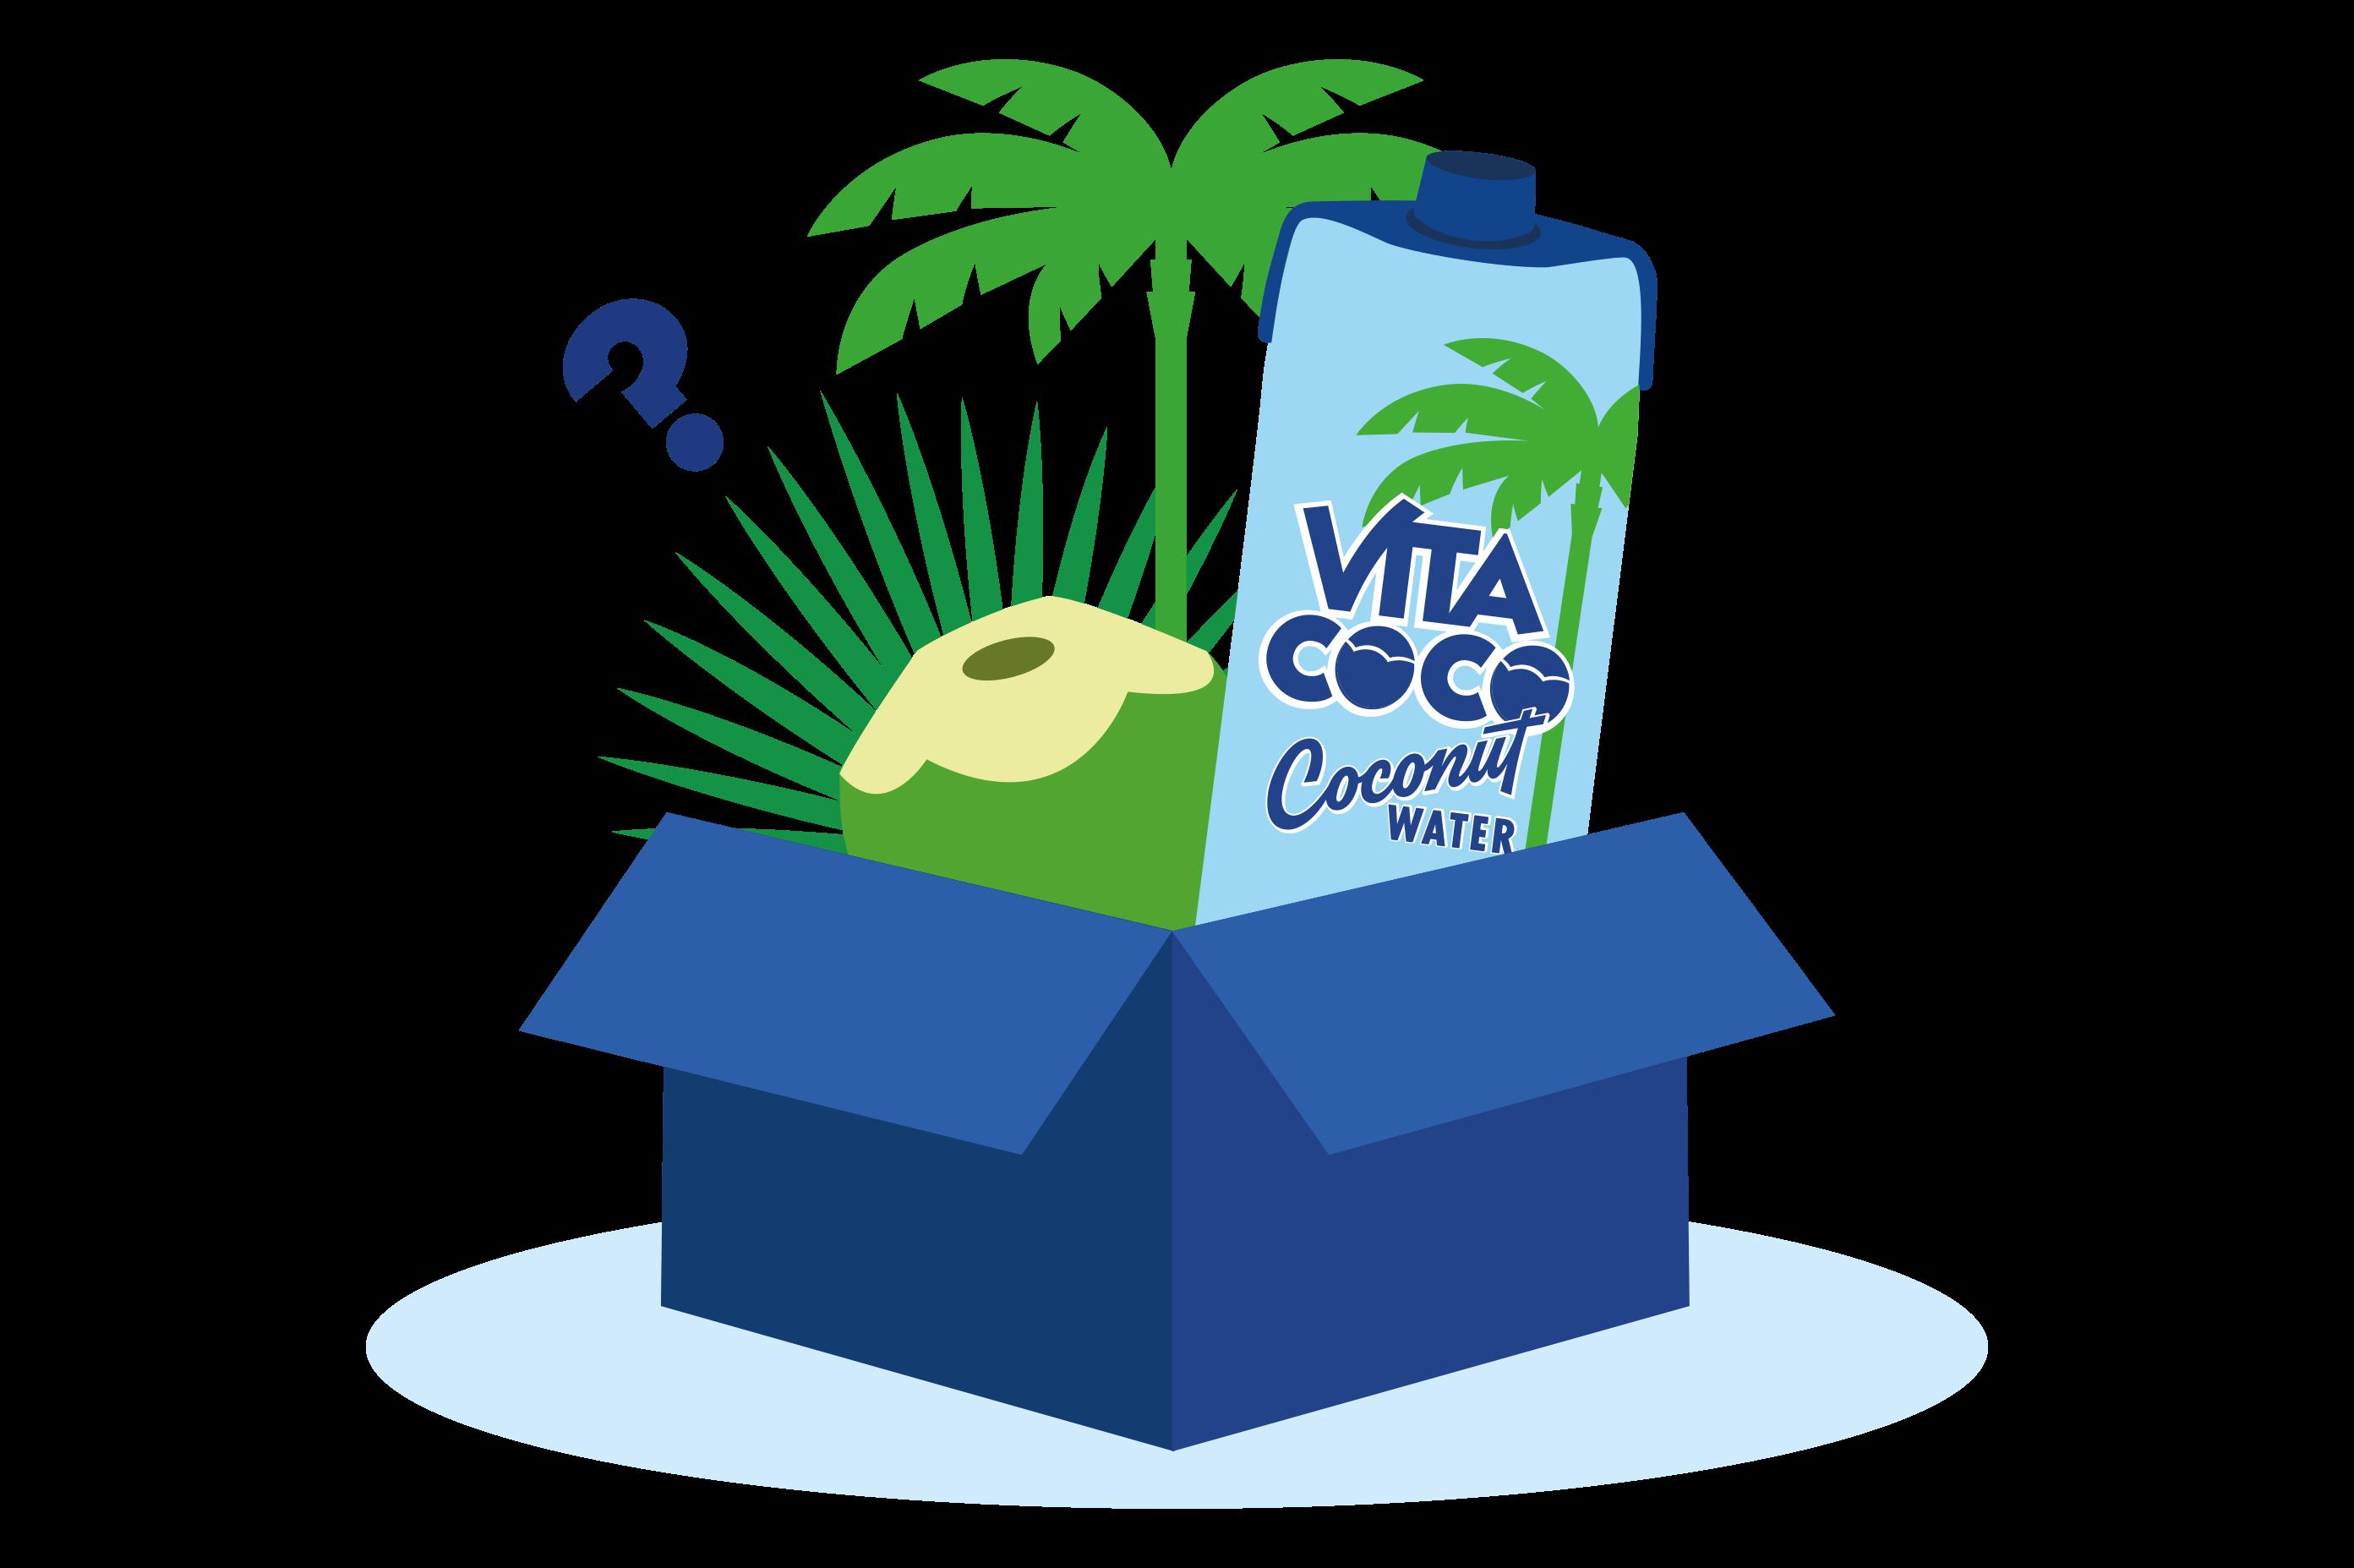 Box with Vita Coco Products